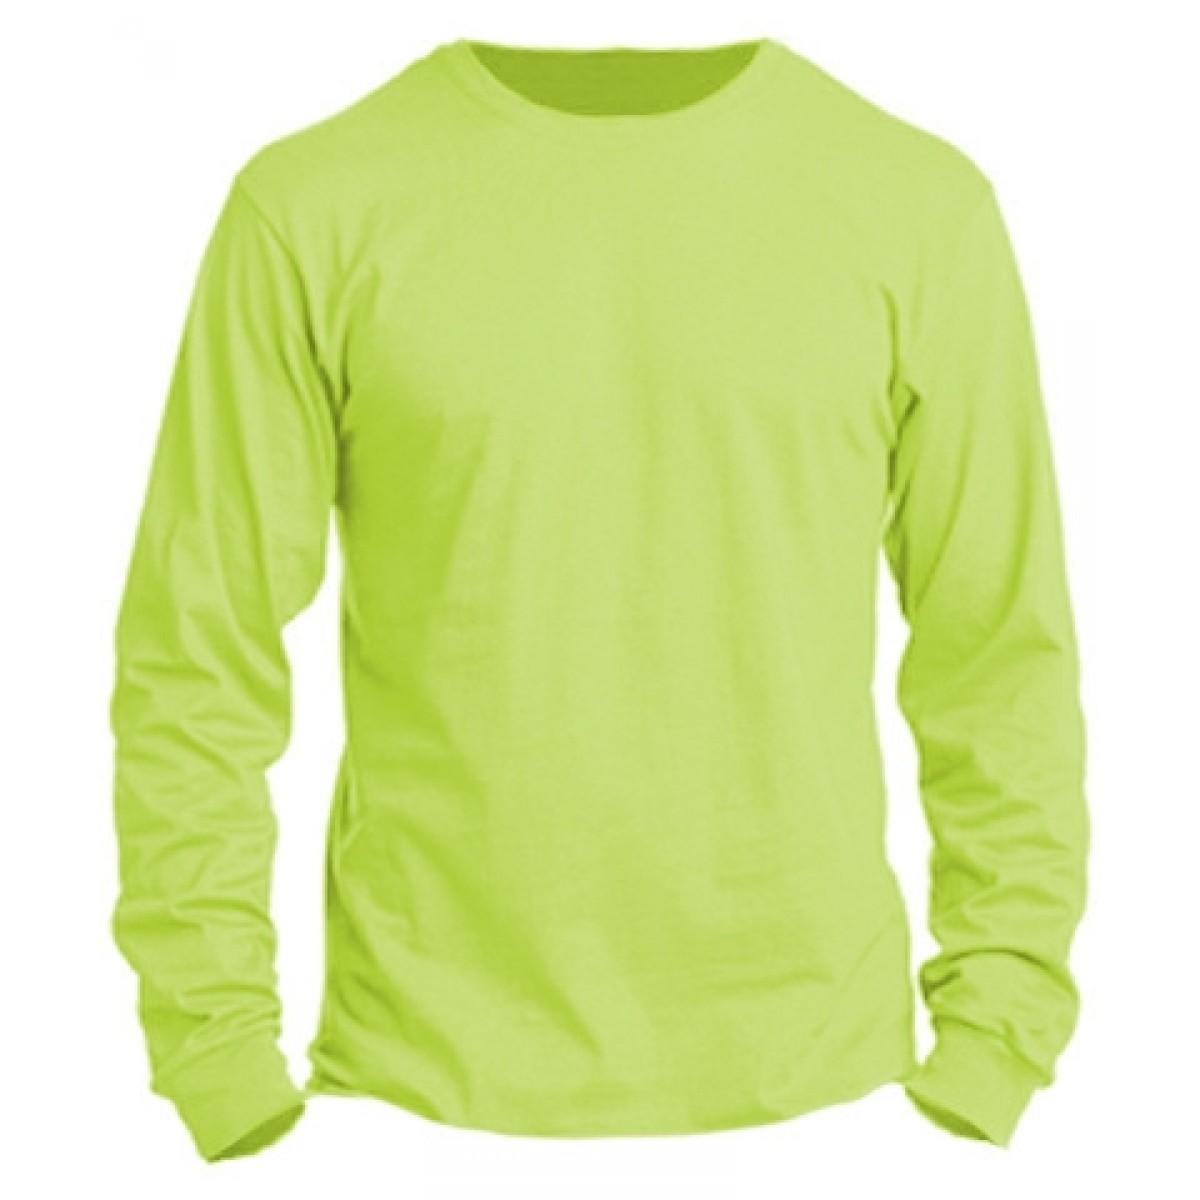 Basic Long Sleeve Crew Neck -Neon Green-L